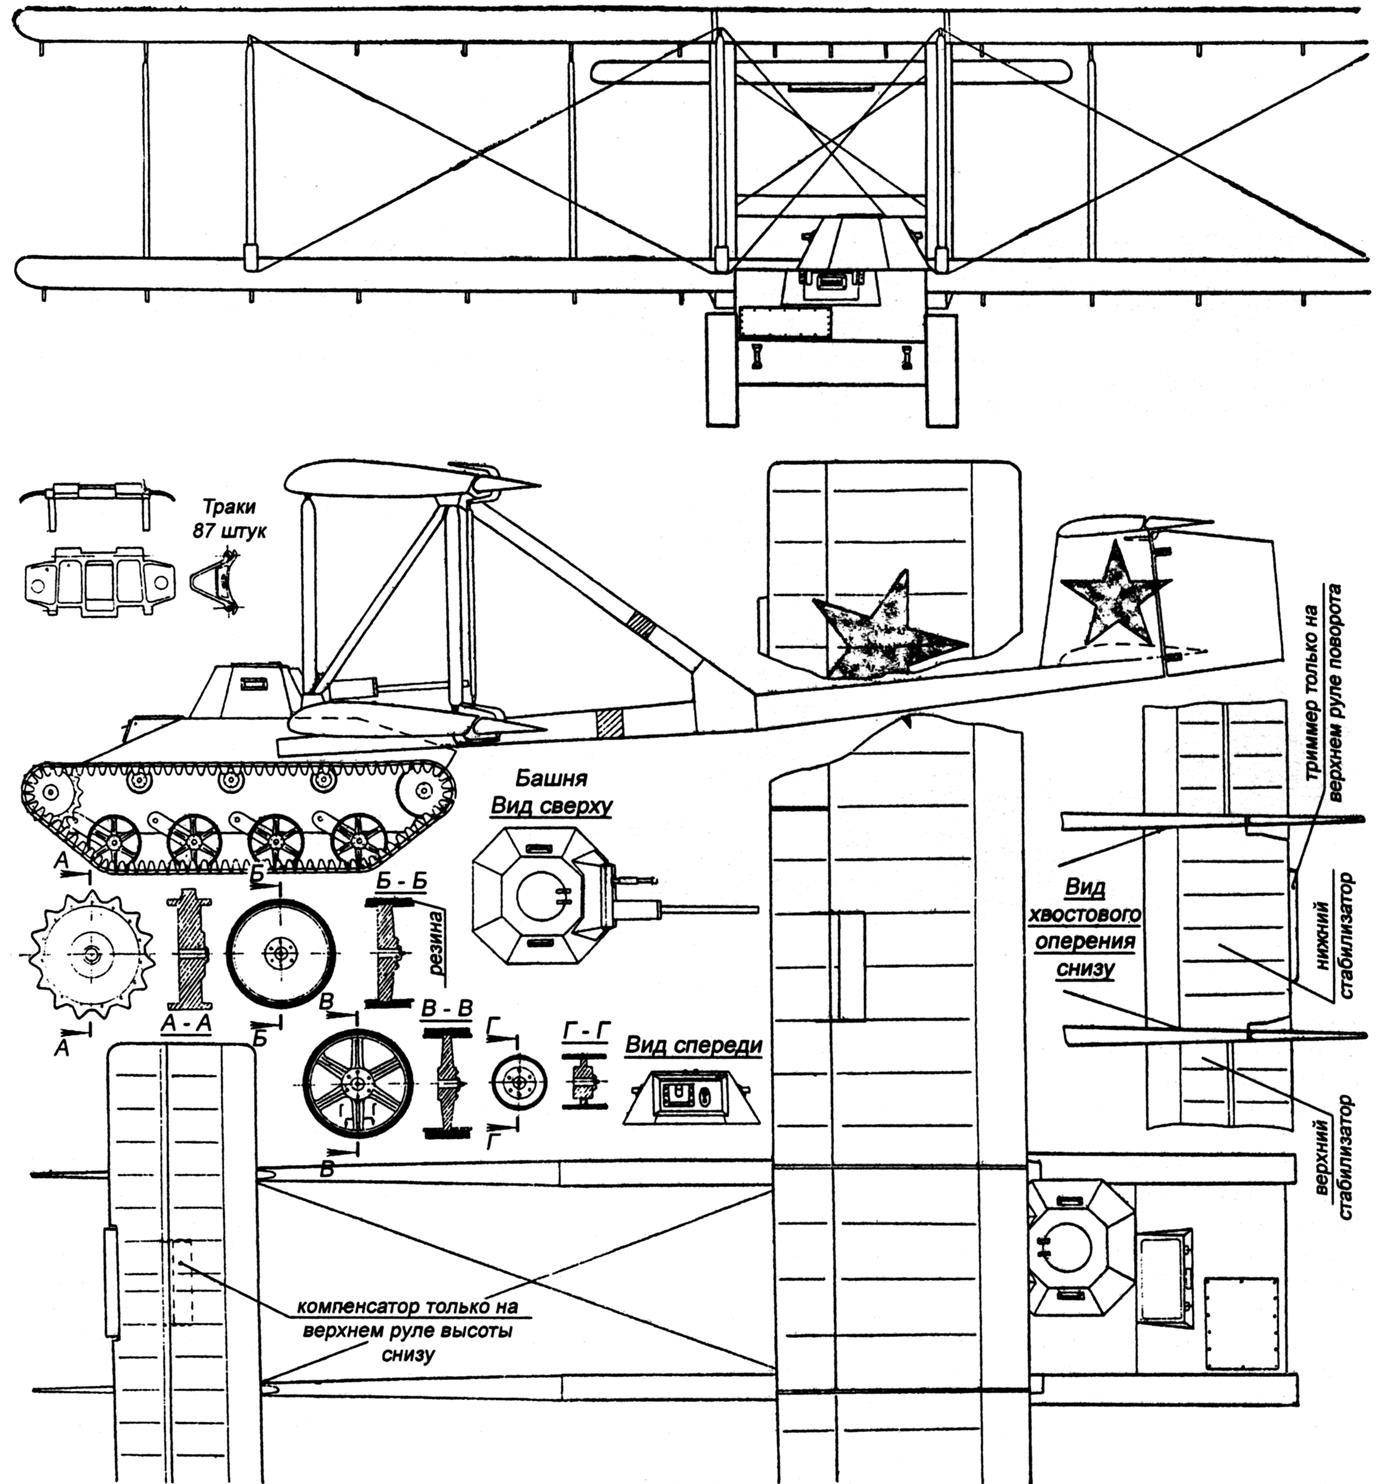 Планёр А-40 с танком Т-60